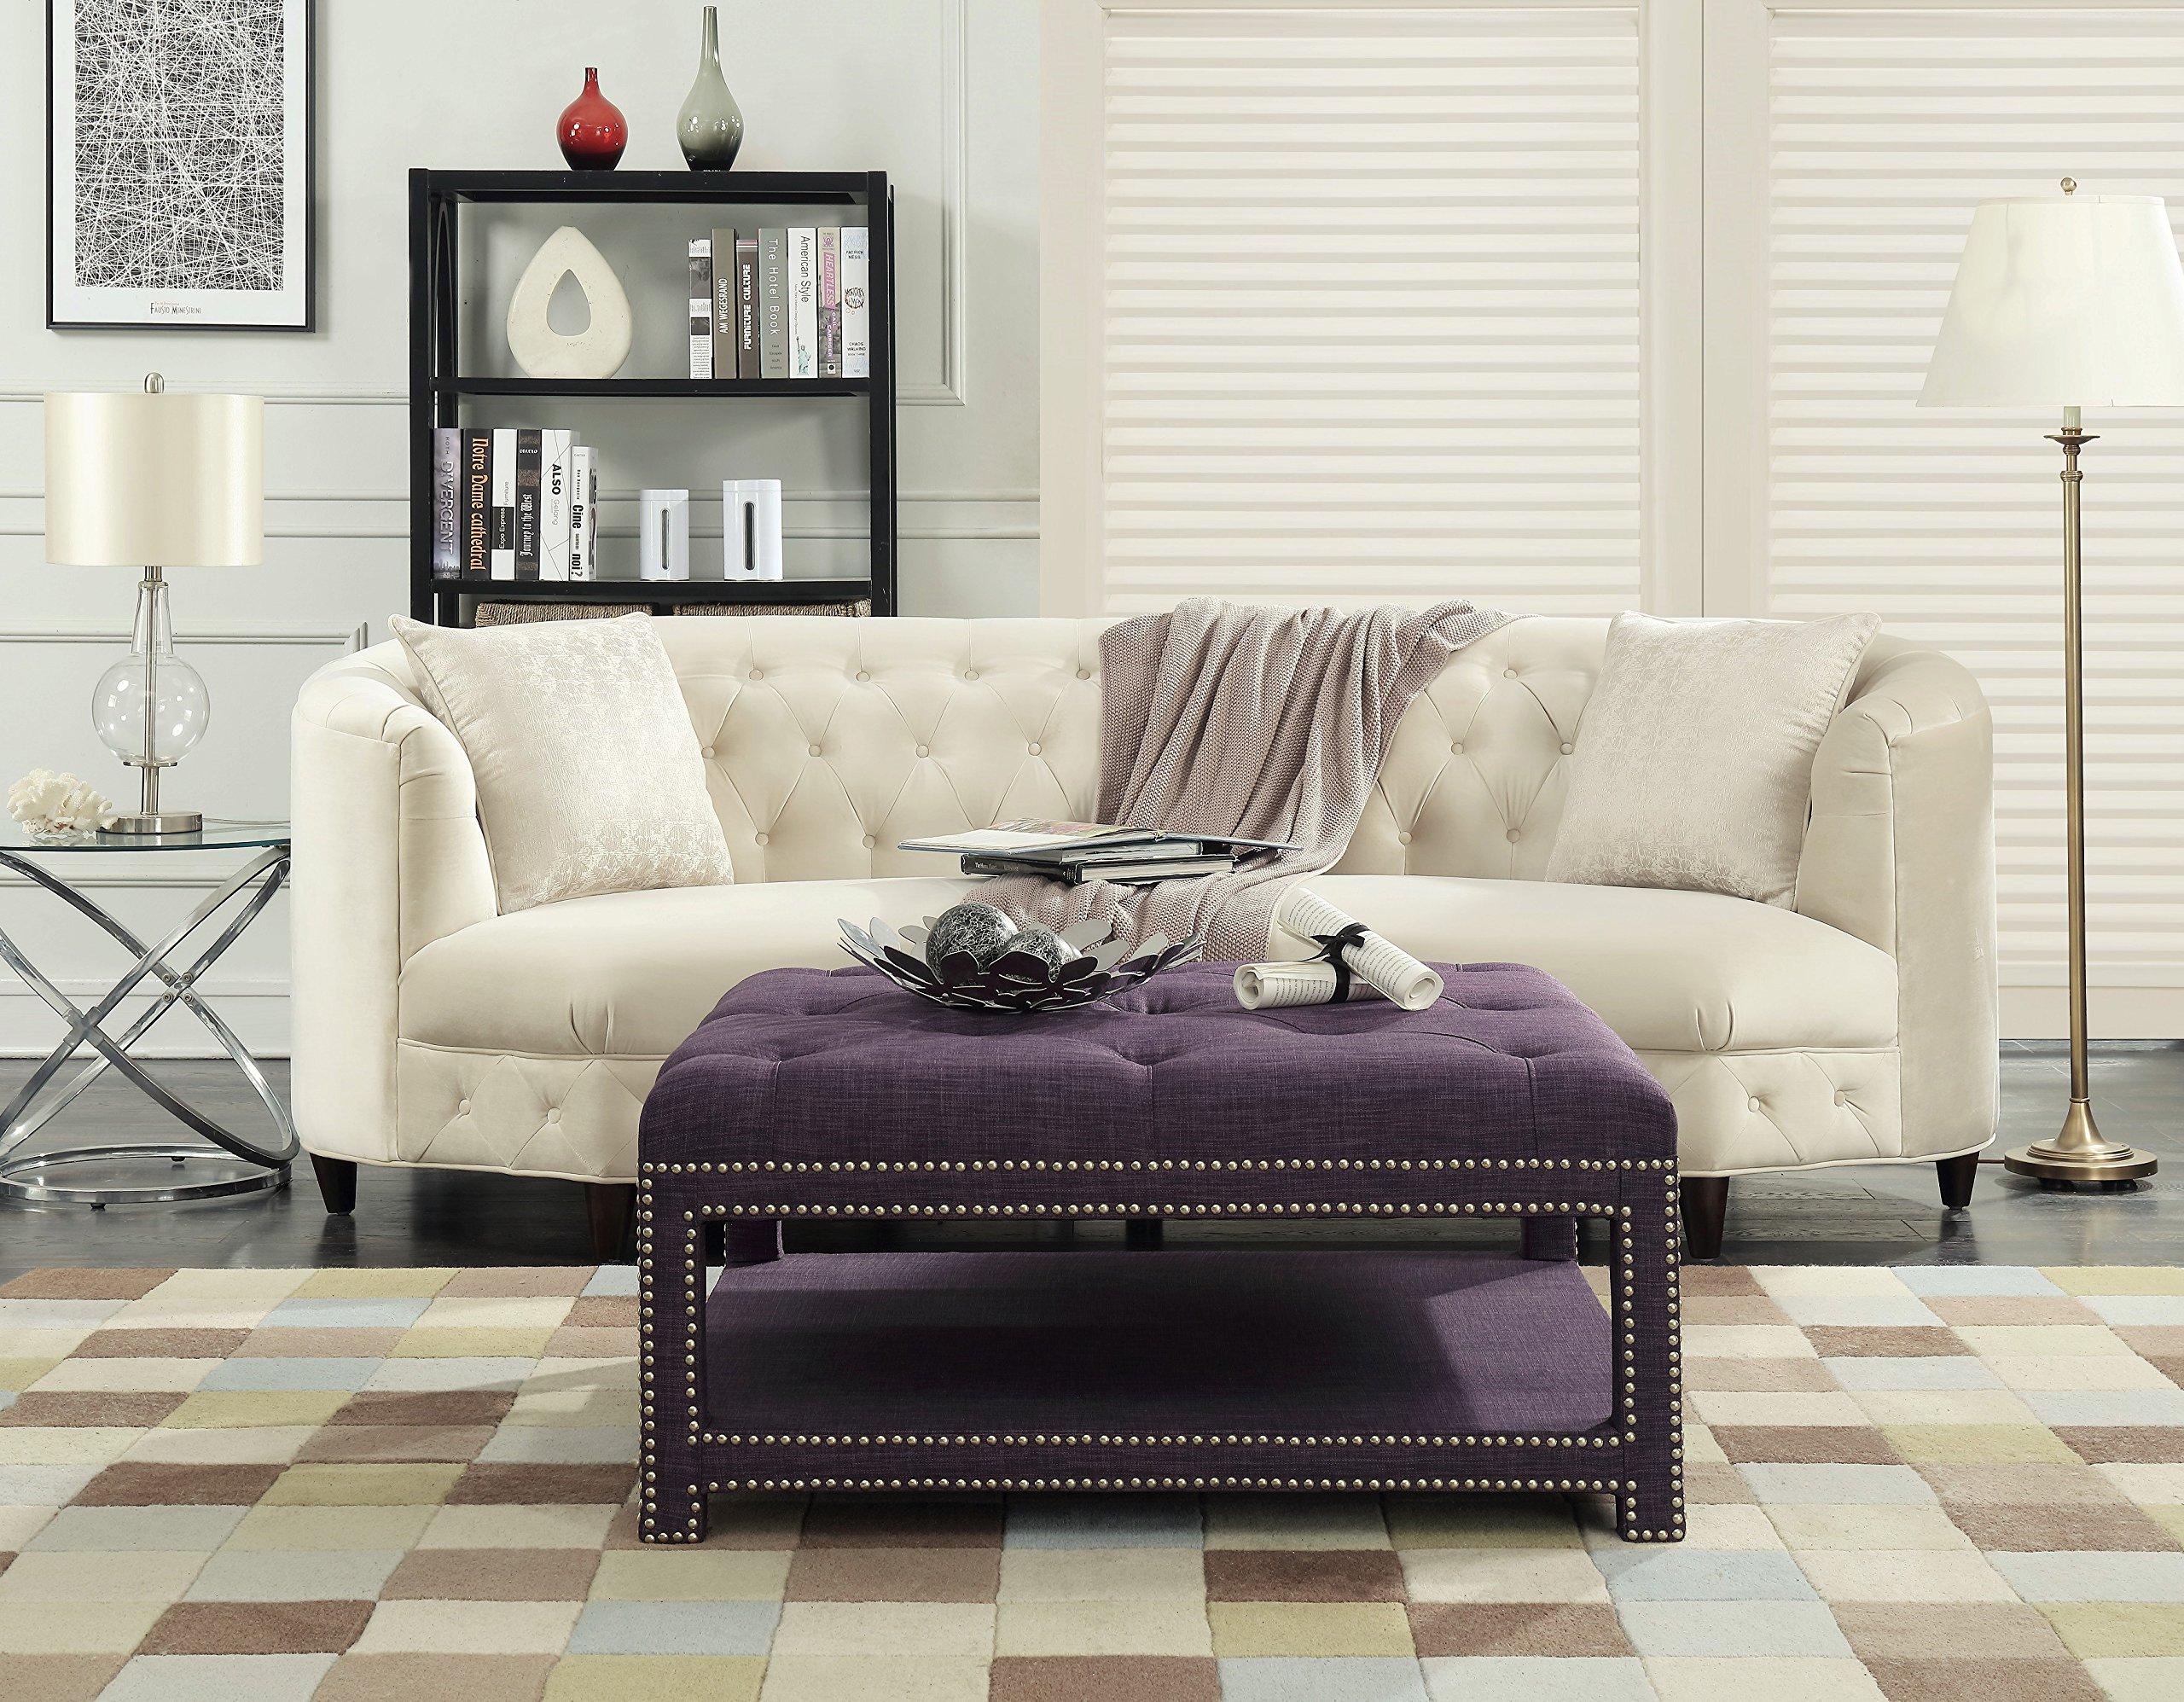 Iconic Home Bina Coffee Table Ottoman 2-Layer Polished Nailhead Tufted Linen Bench, Purple